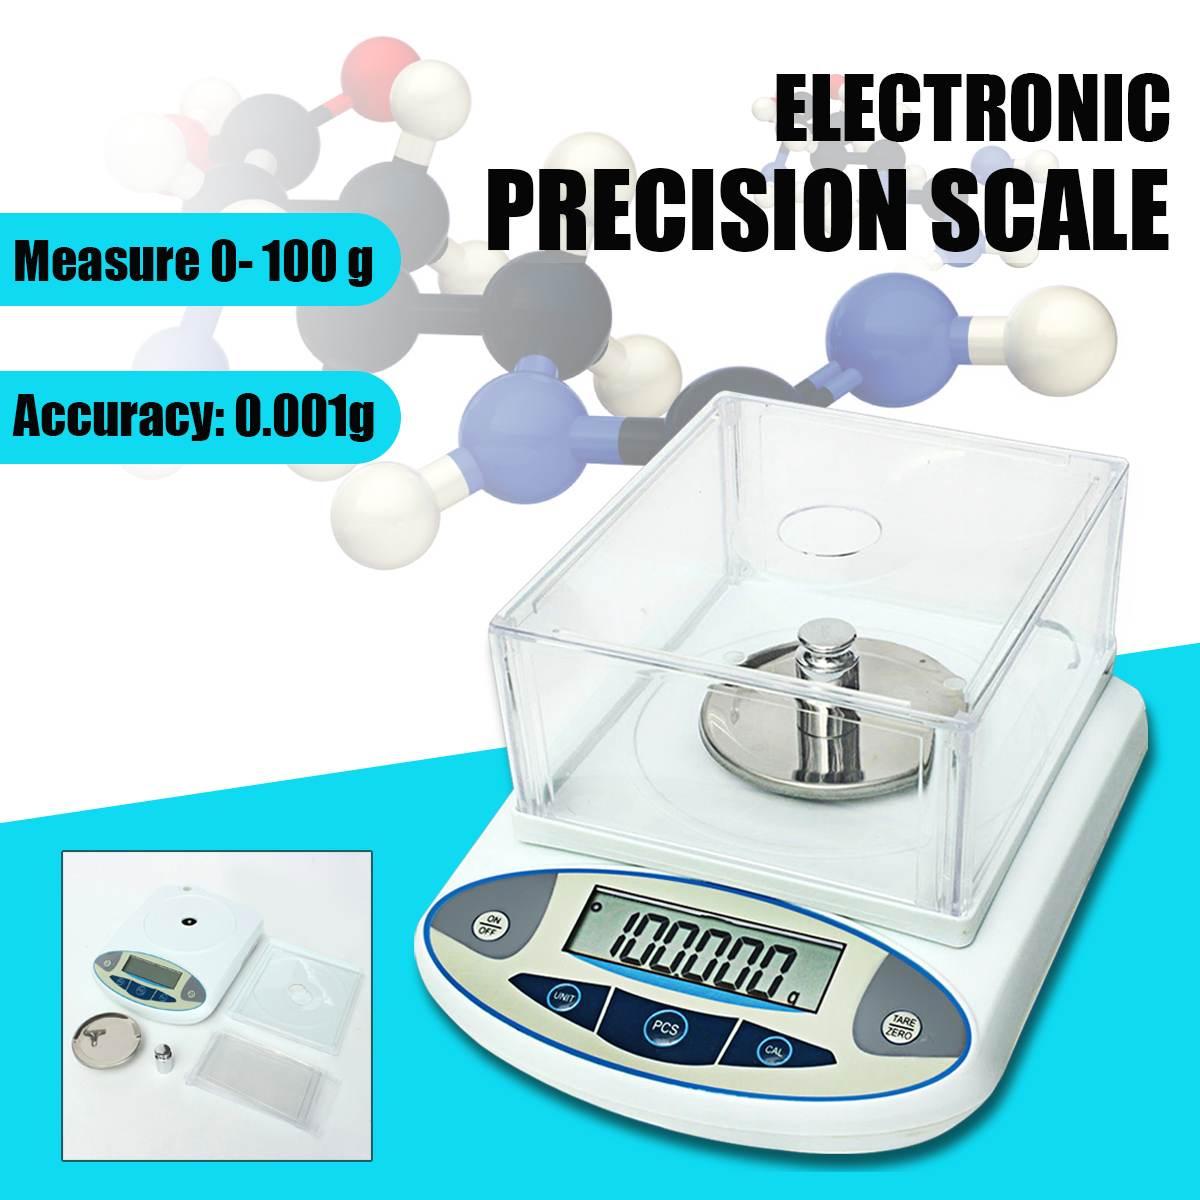 ميزان رقمي ZEAST 100x0.001g 1mg مختبر LCD رقمي تحليلي ميزان إلكتروني دقيق مجوهرات مقياس وزن محمول